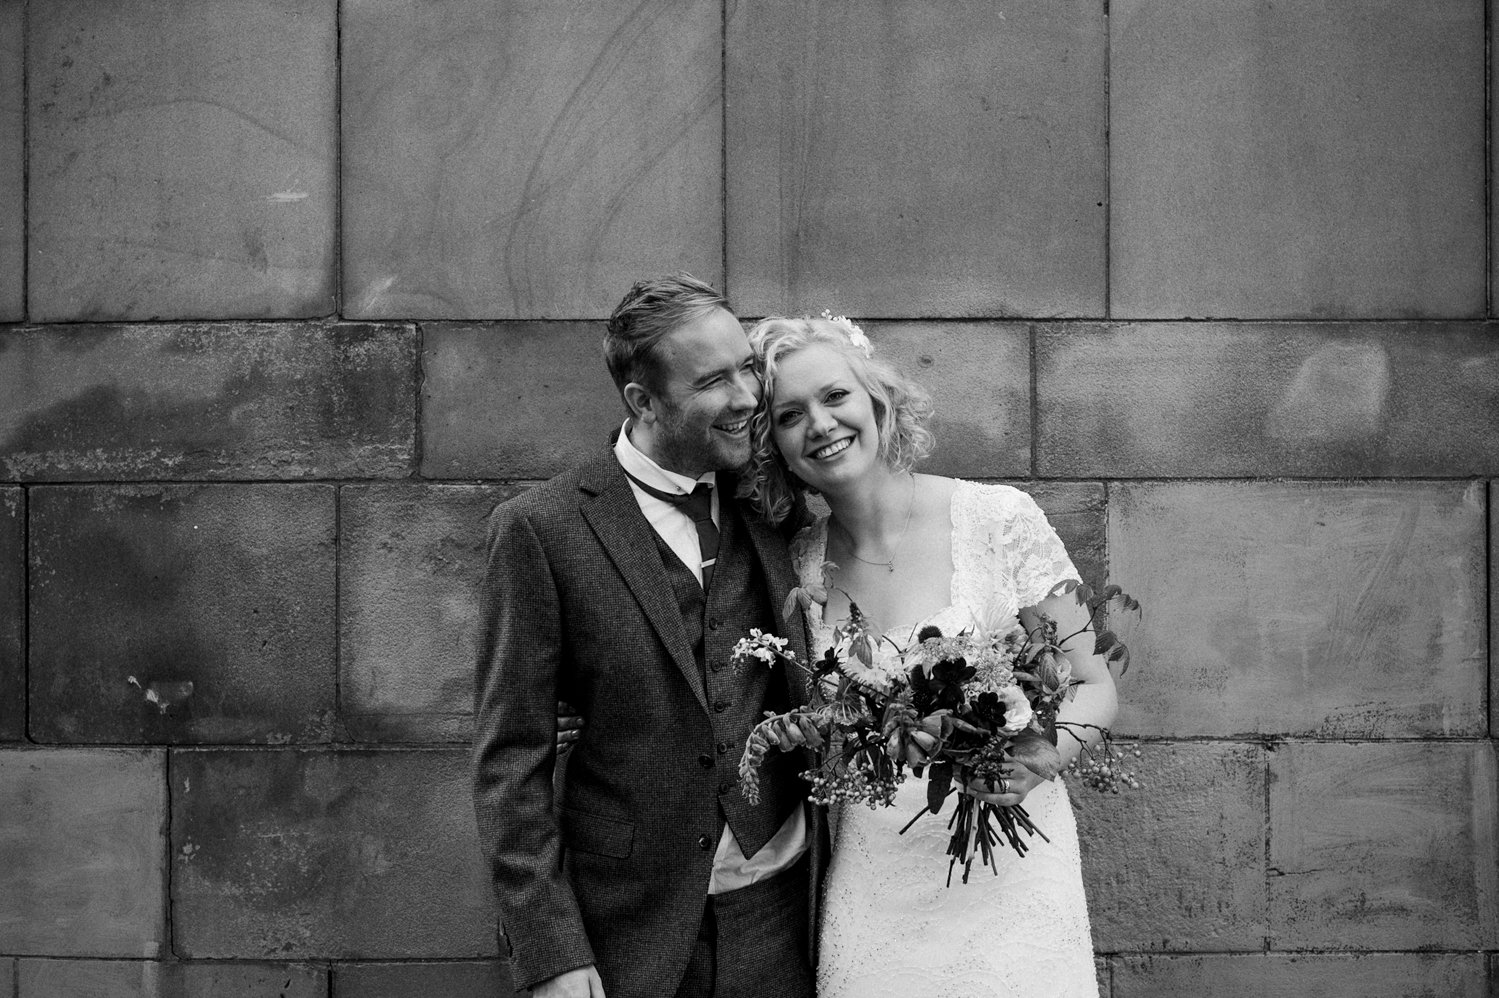 Phase Eight bride with Jigsaw groom wedding portrait Scotland